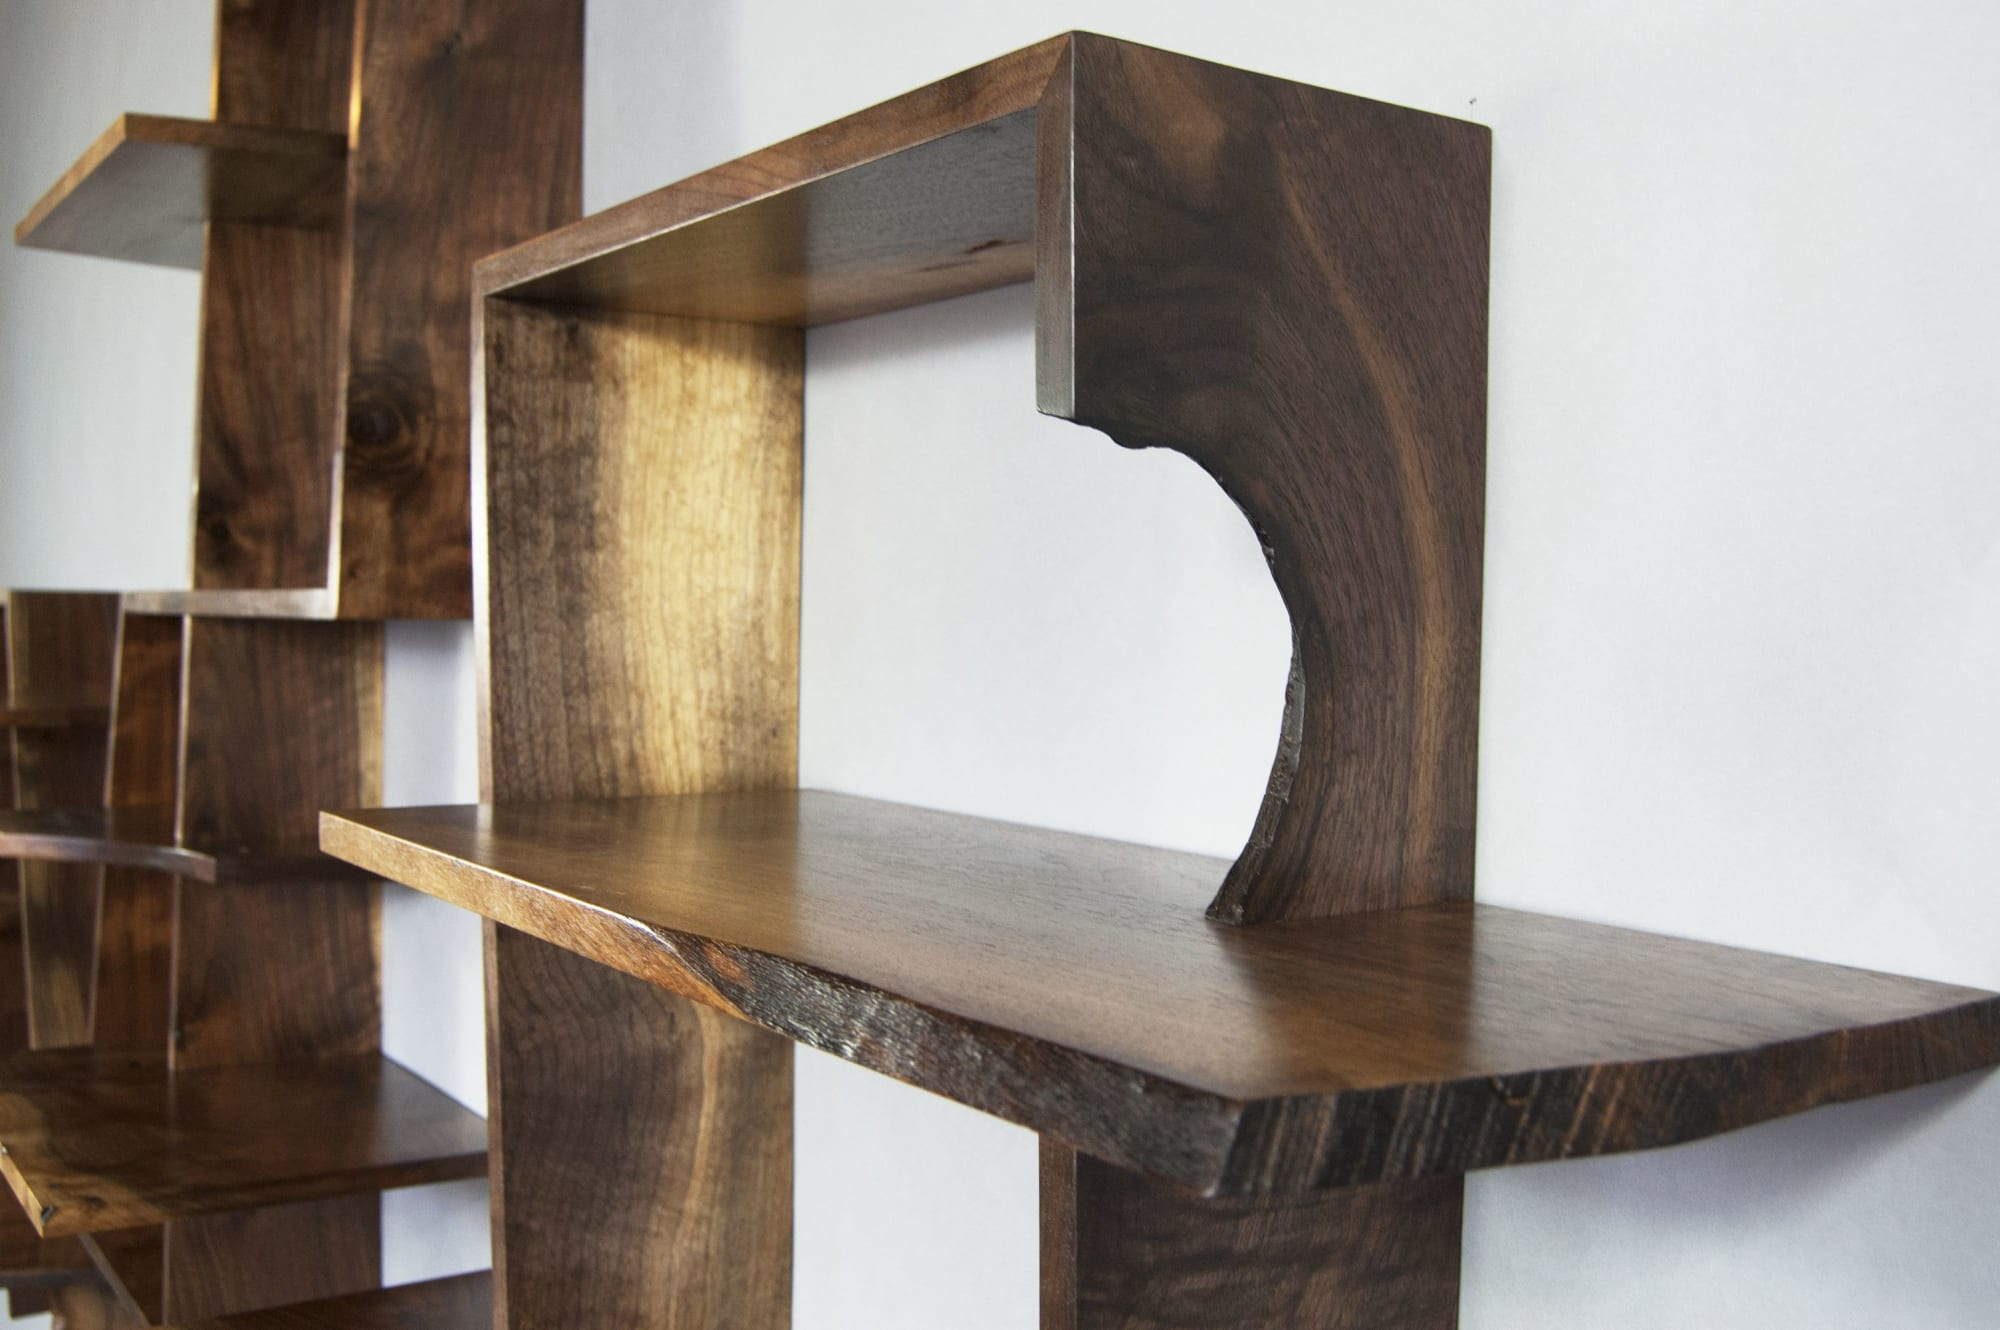 Furniture by Austin Heitzman Furniture seen at Private Residence, Boston - Cahn Shelf